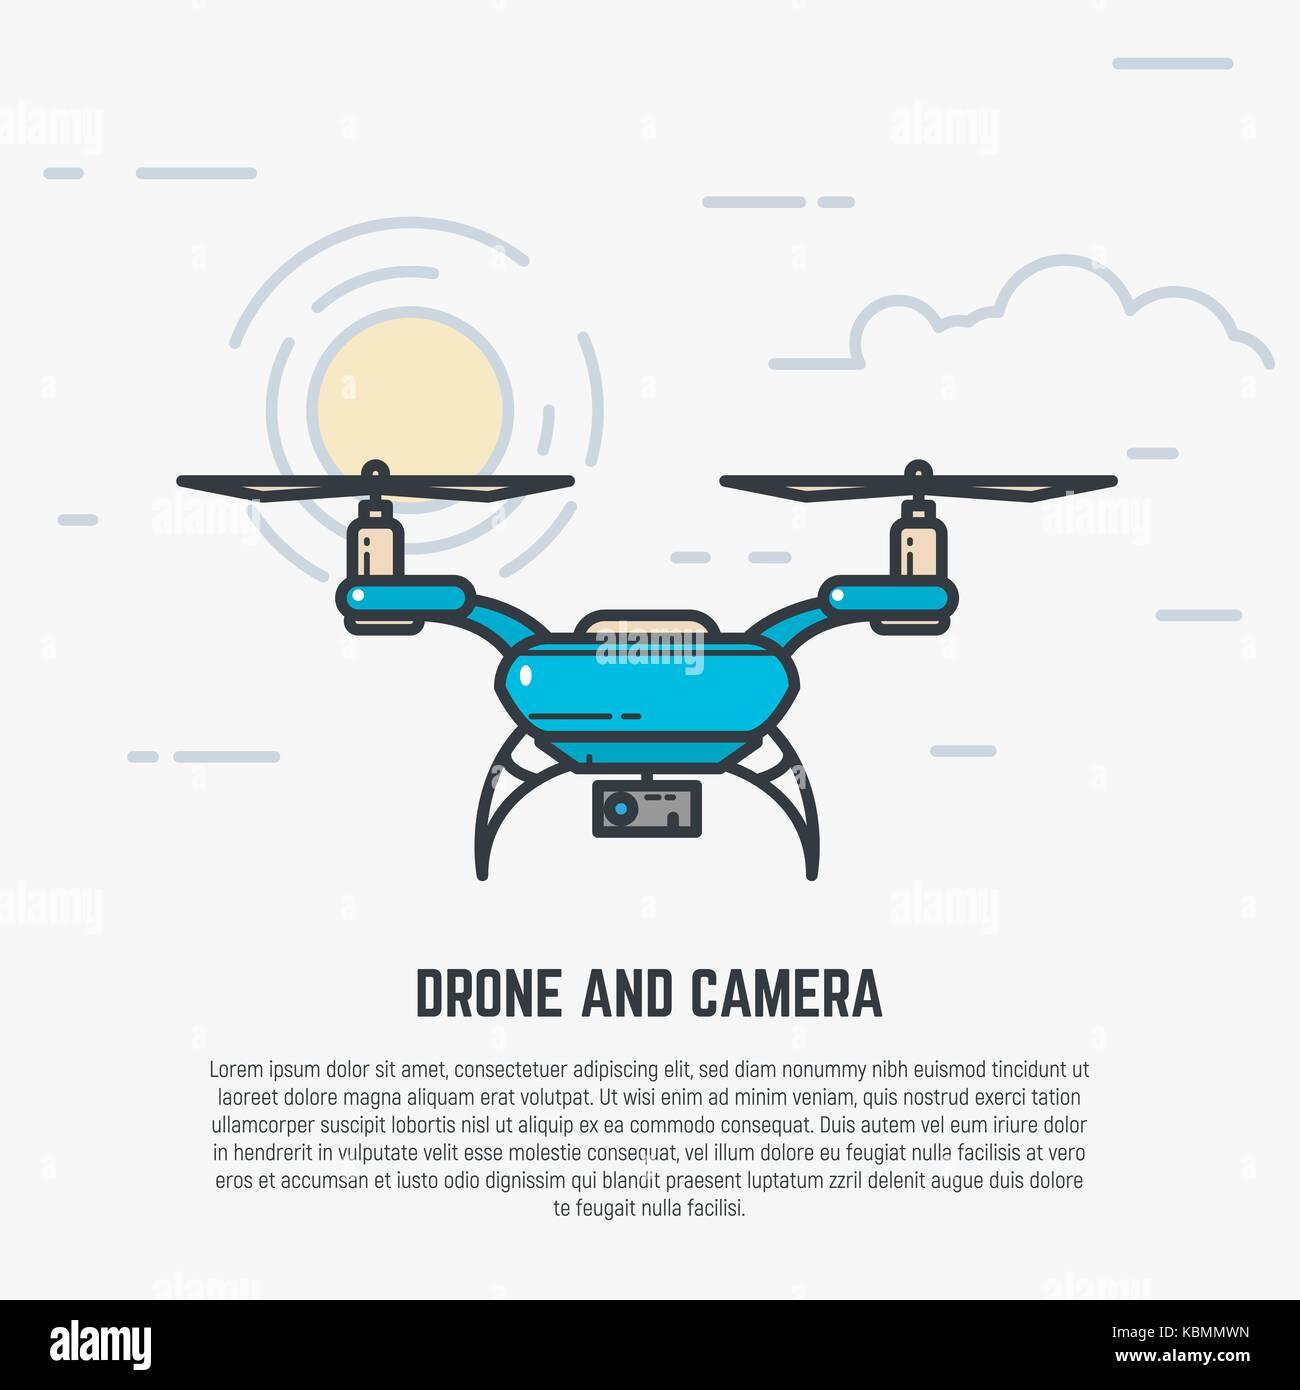 Quadcopter line illustration - Stock Image